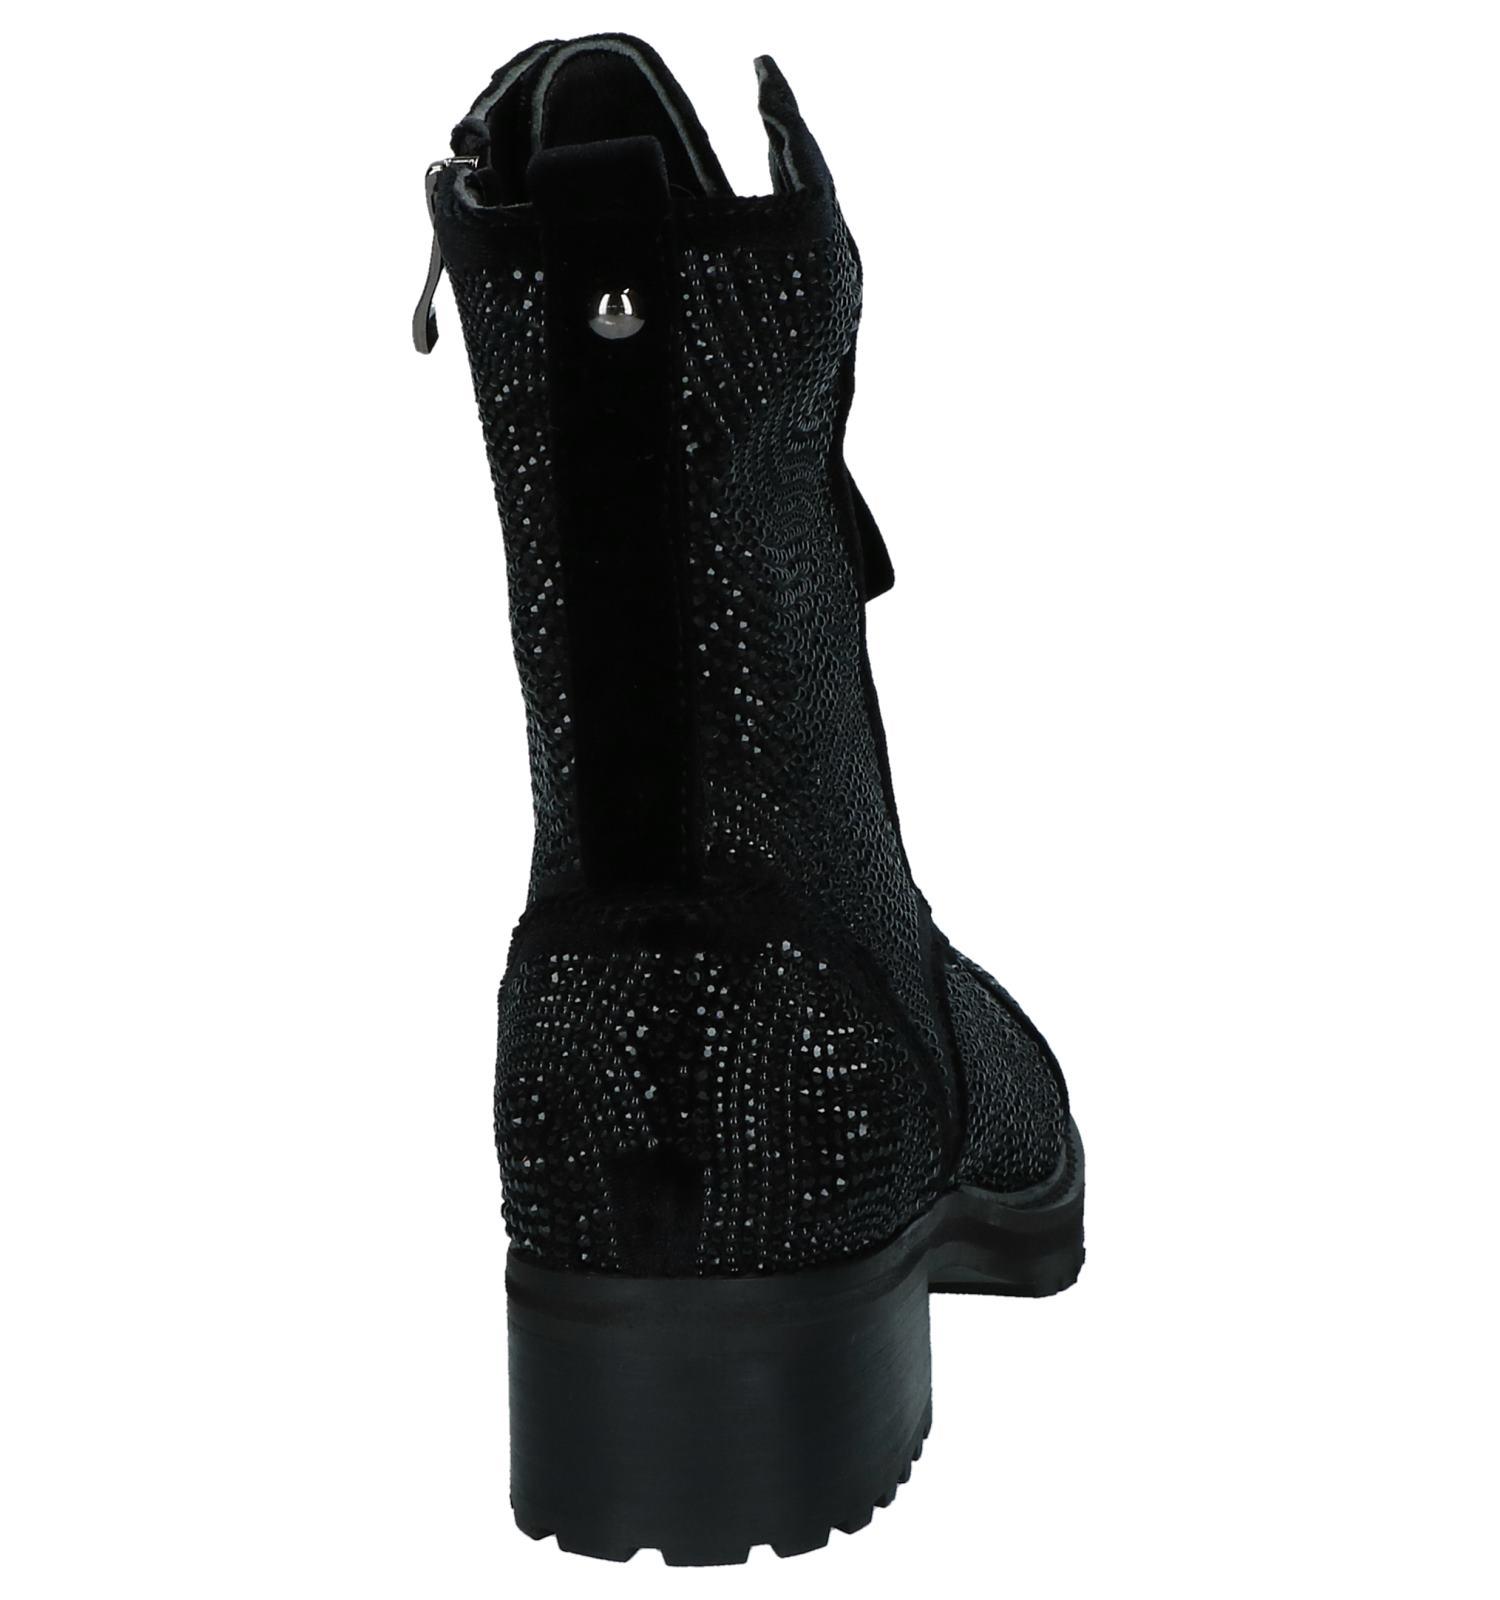 Pena En Met Steentjes Alma Boots f6gy7b